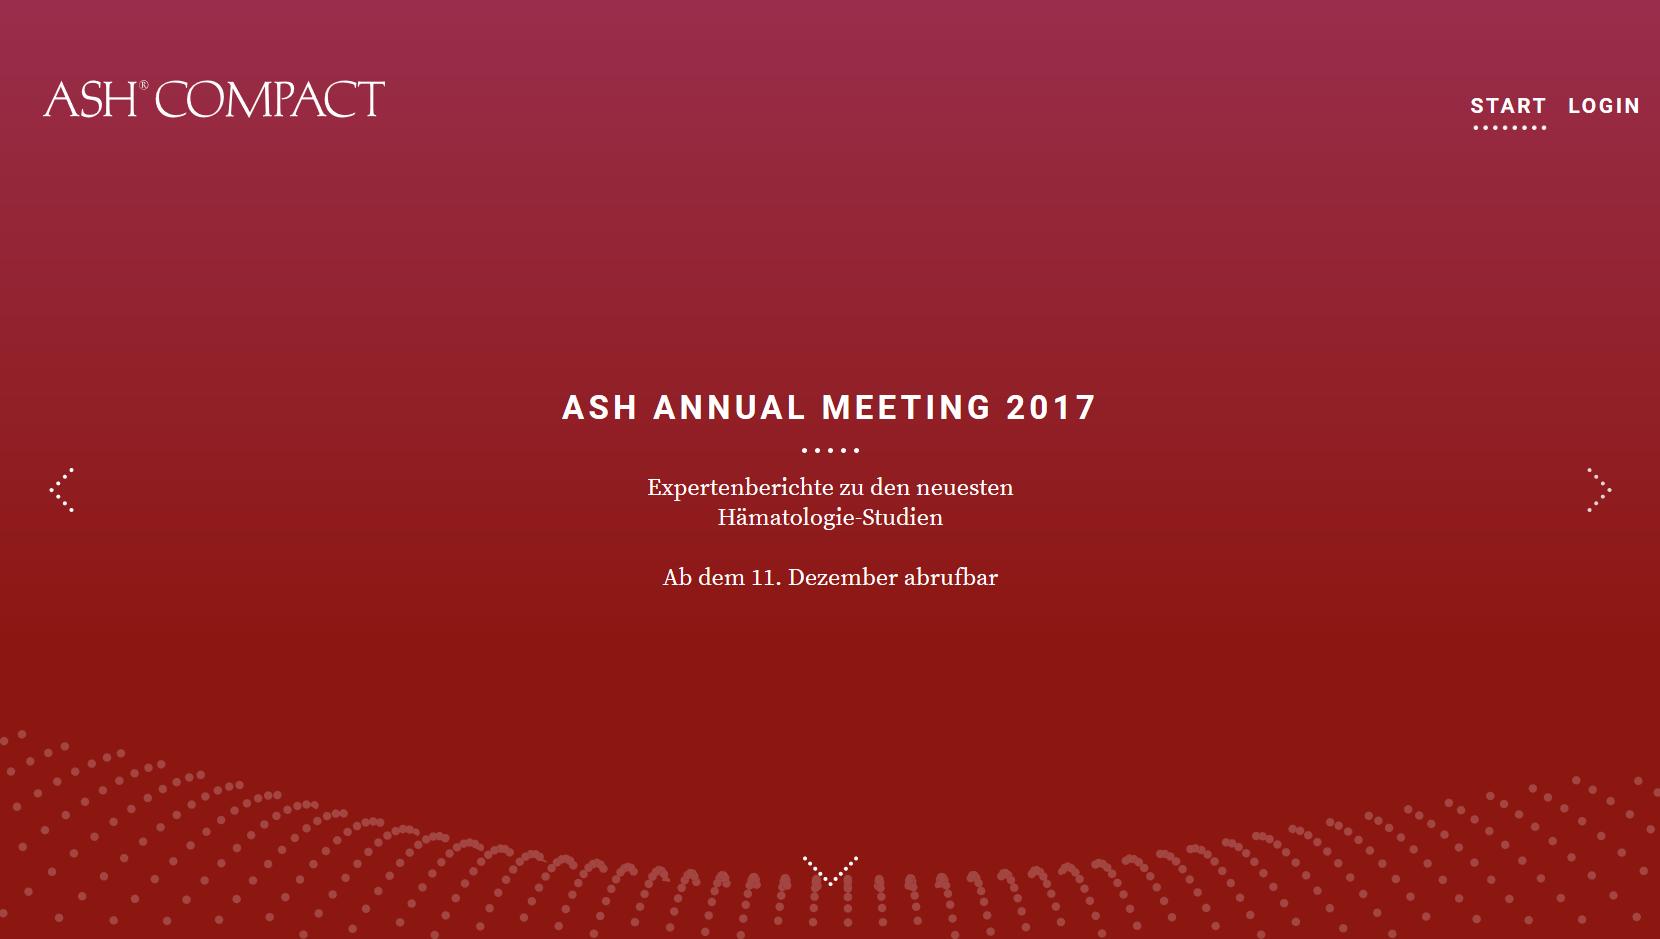 ASH COMPACT, Webseite (Screenshot), © art tempi communications